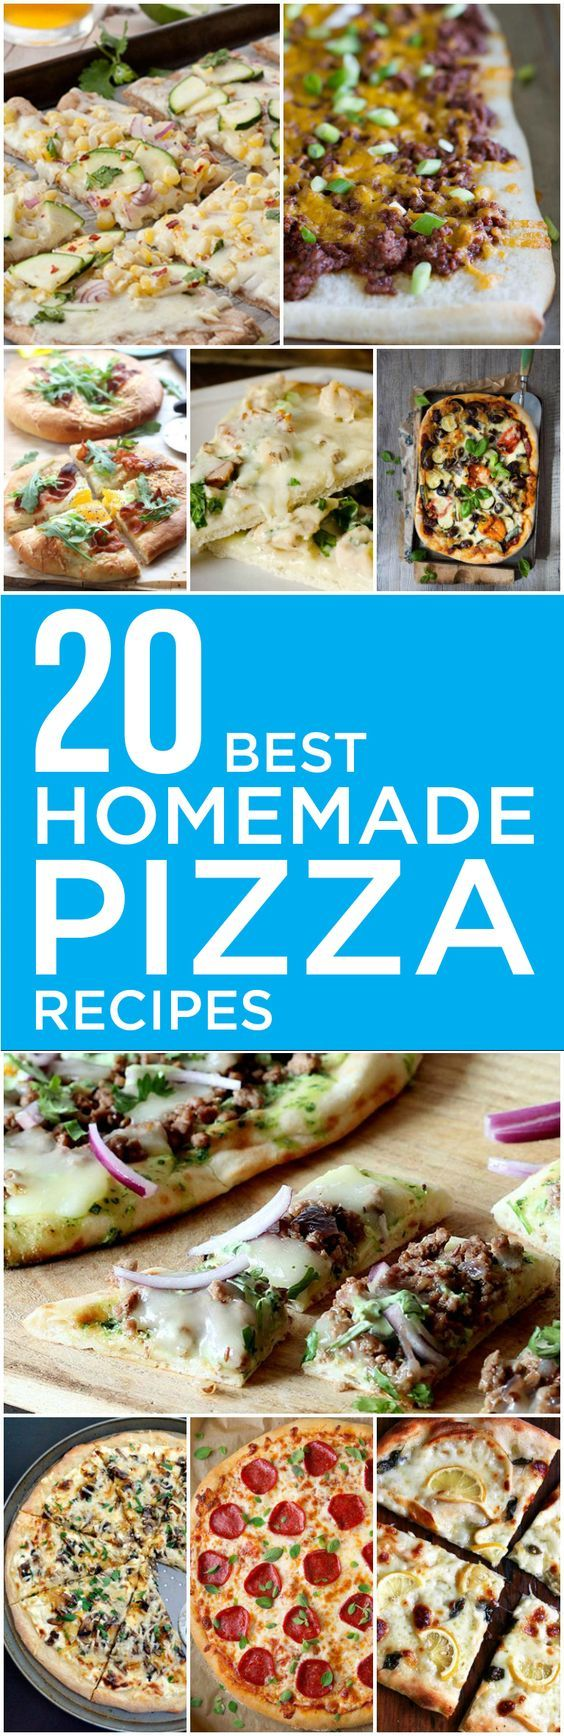 17 best dinner recipes images on Pinterest   Cook, Dinner recipes ...